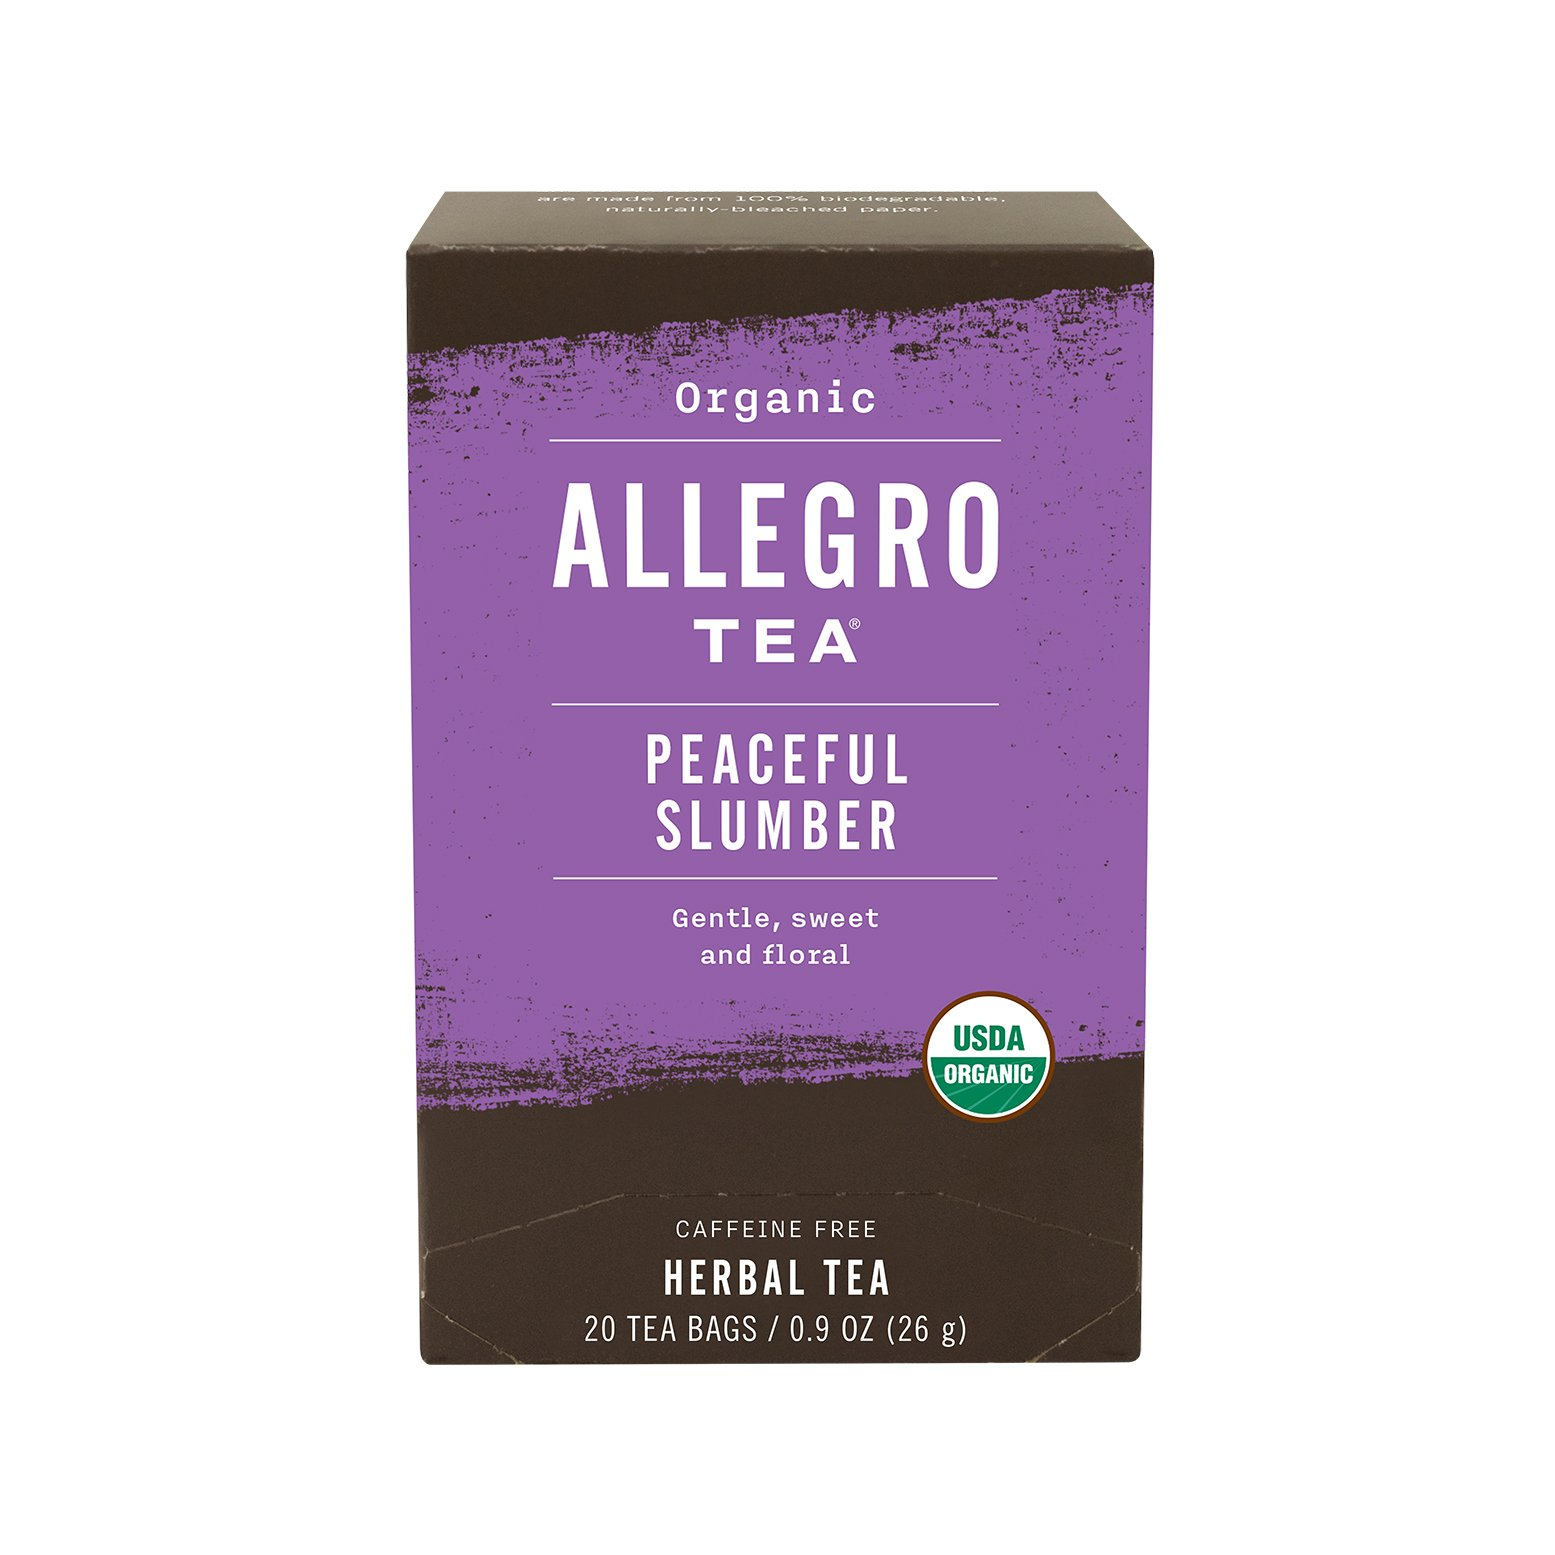 Allegro Tea, Organic Peaceful Slumber Tea Bags, 20 ct